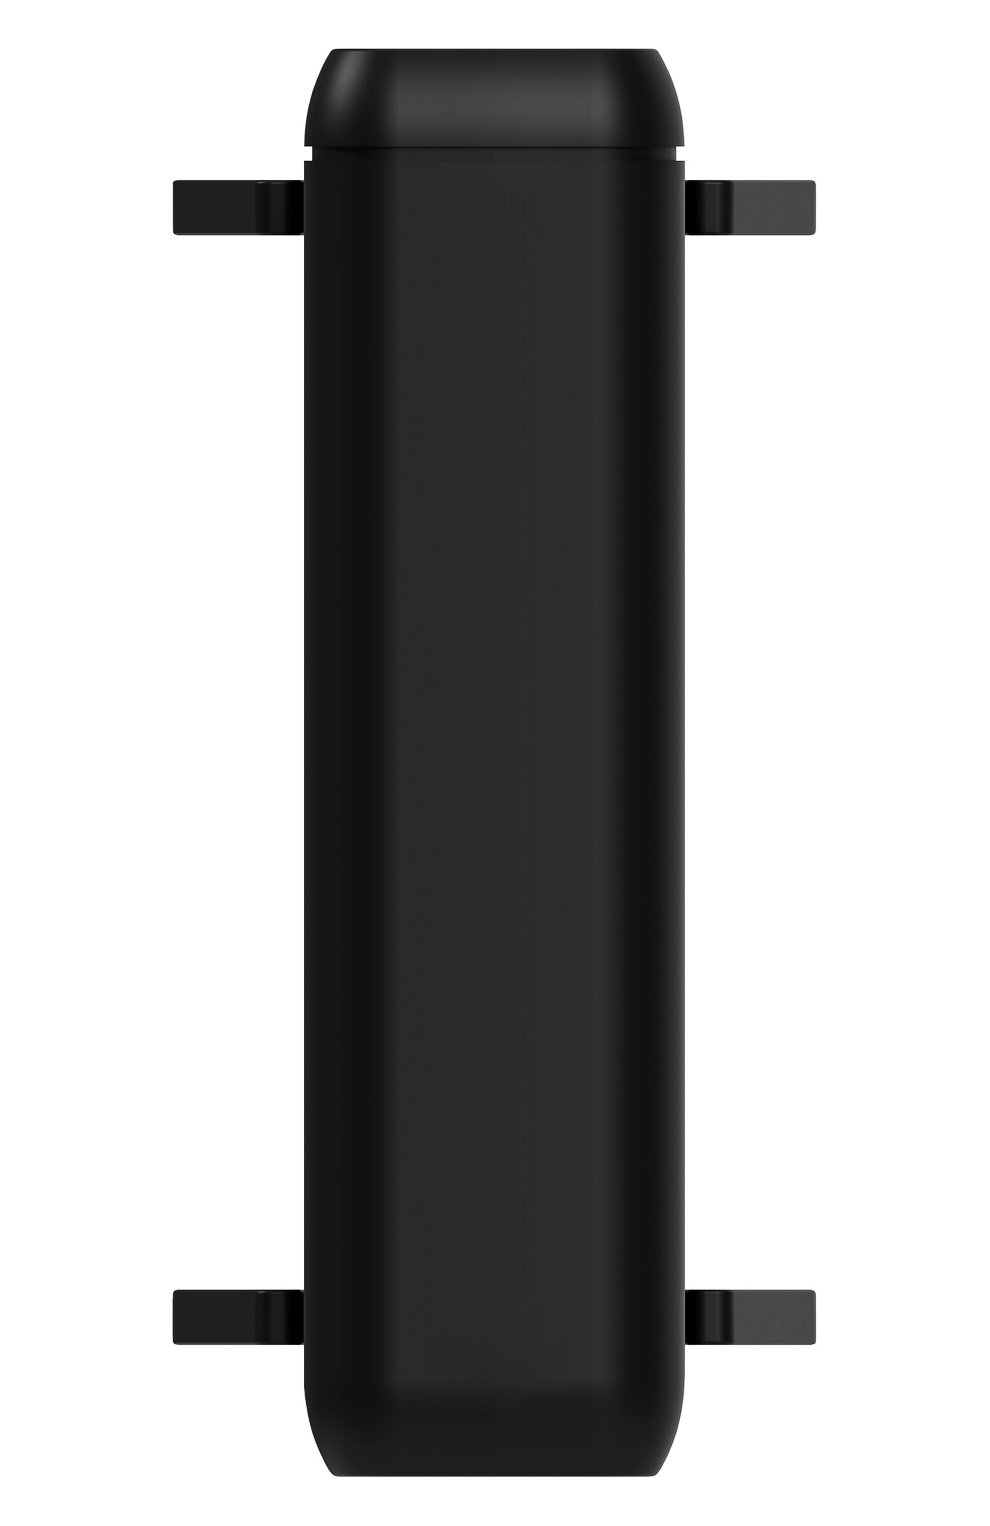 Сетевое зарядное устройство power station 75w VIPE черного цвета, арт. VPPST75WBLK | Фото 5